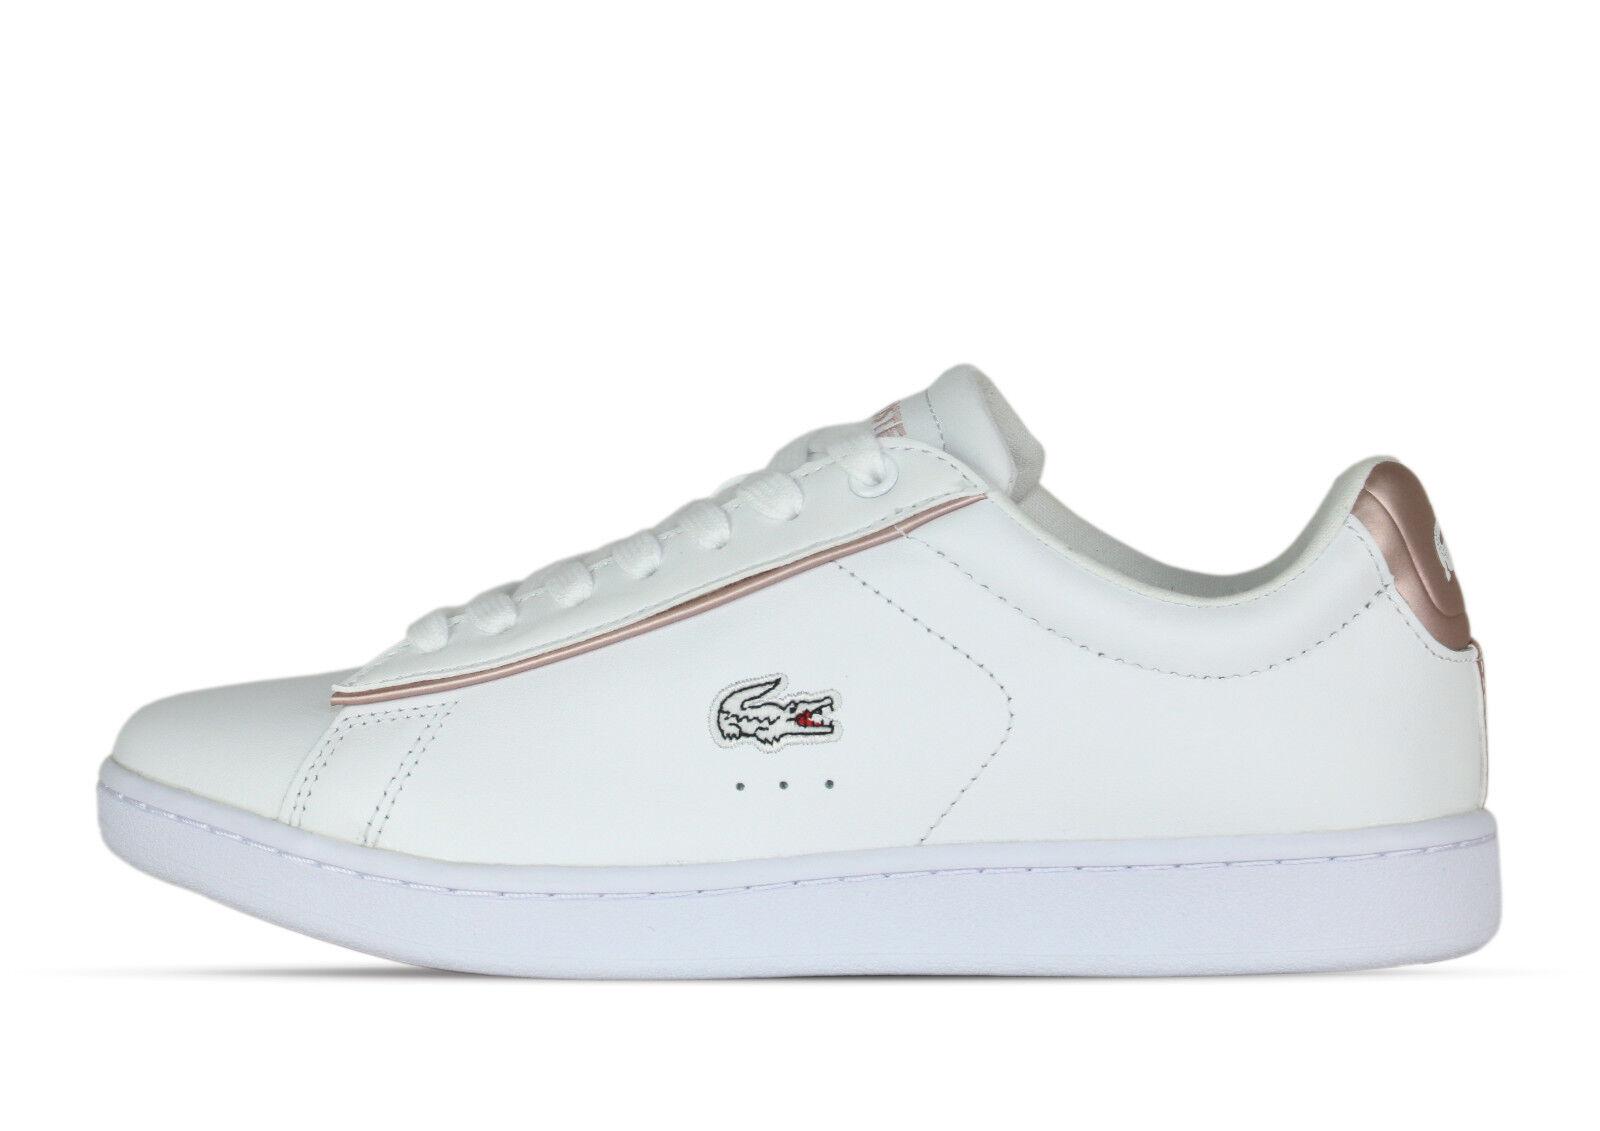 Lacoste Carnaby Evo 217 Weiß weiß 733SPW10241Y9 - Sneaker - weiß Weiß - Damens +Neu+ 7d6707